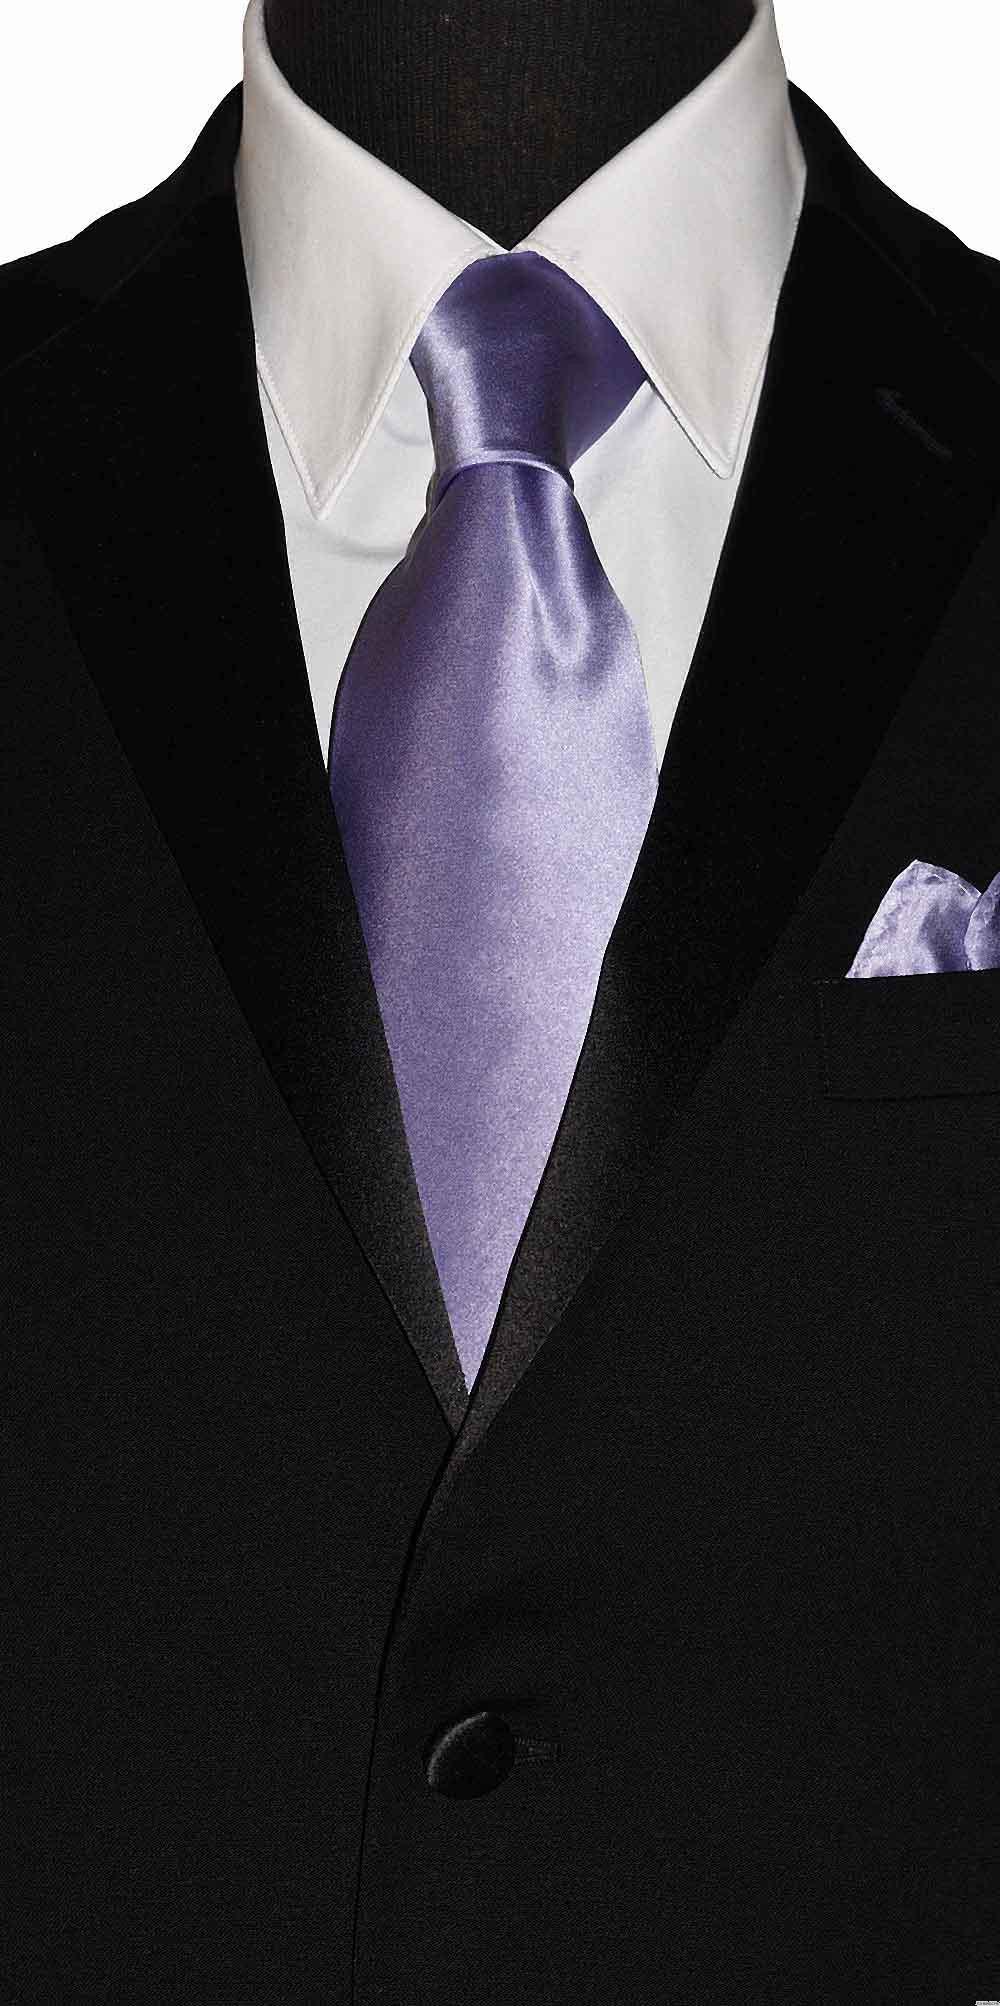 lilac-orchid men's long tie at tuxbling.com